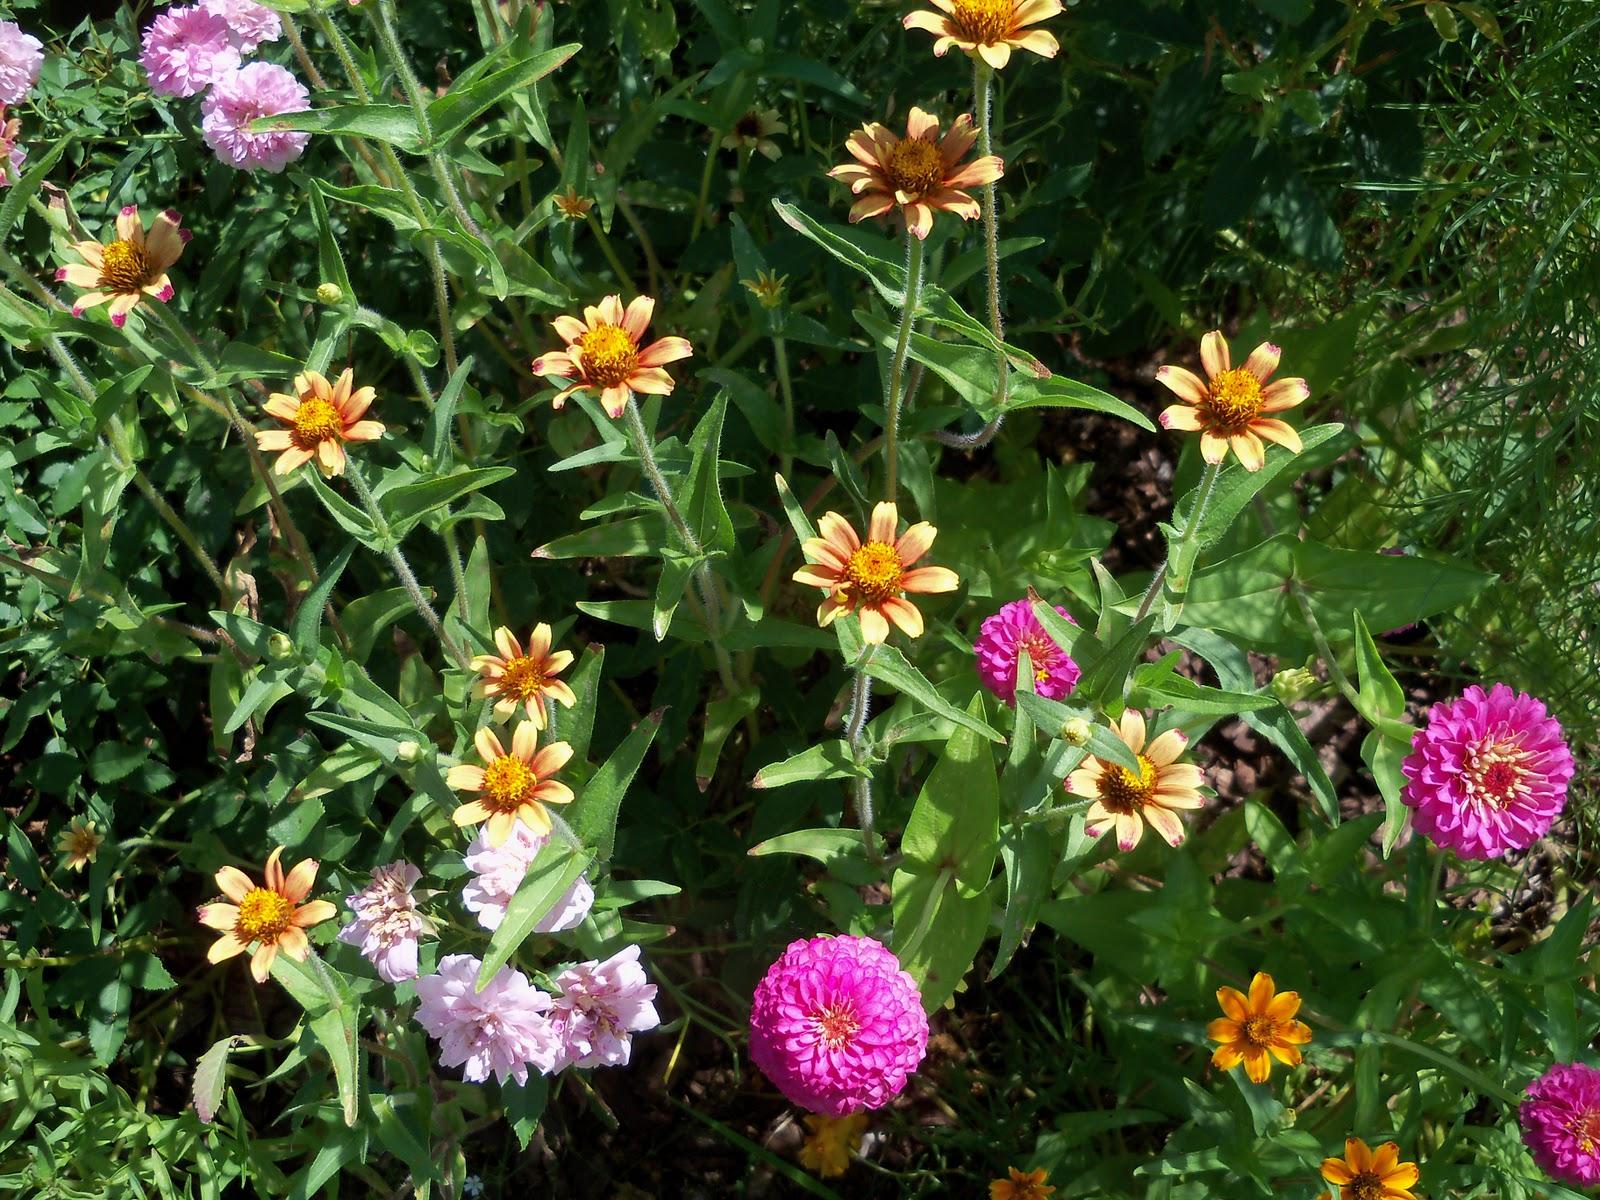 Gardening 2010, Part Three - 101_4372.JPG